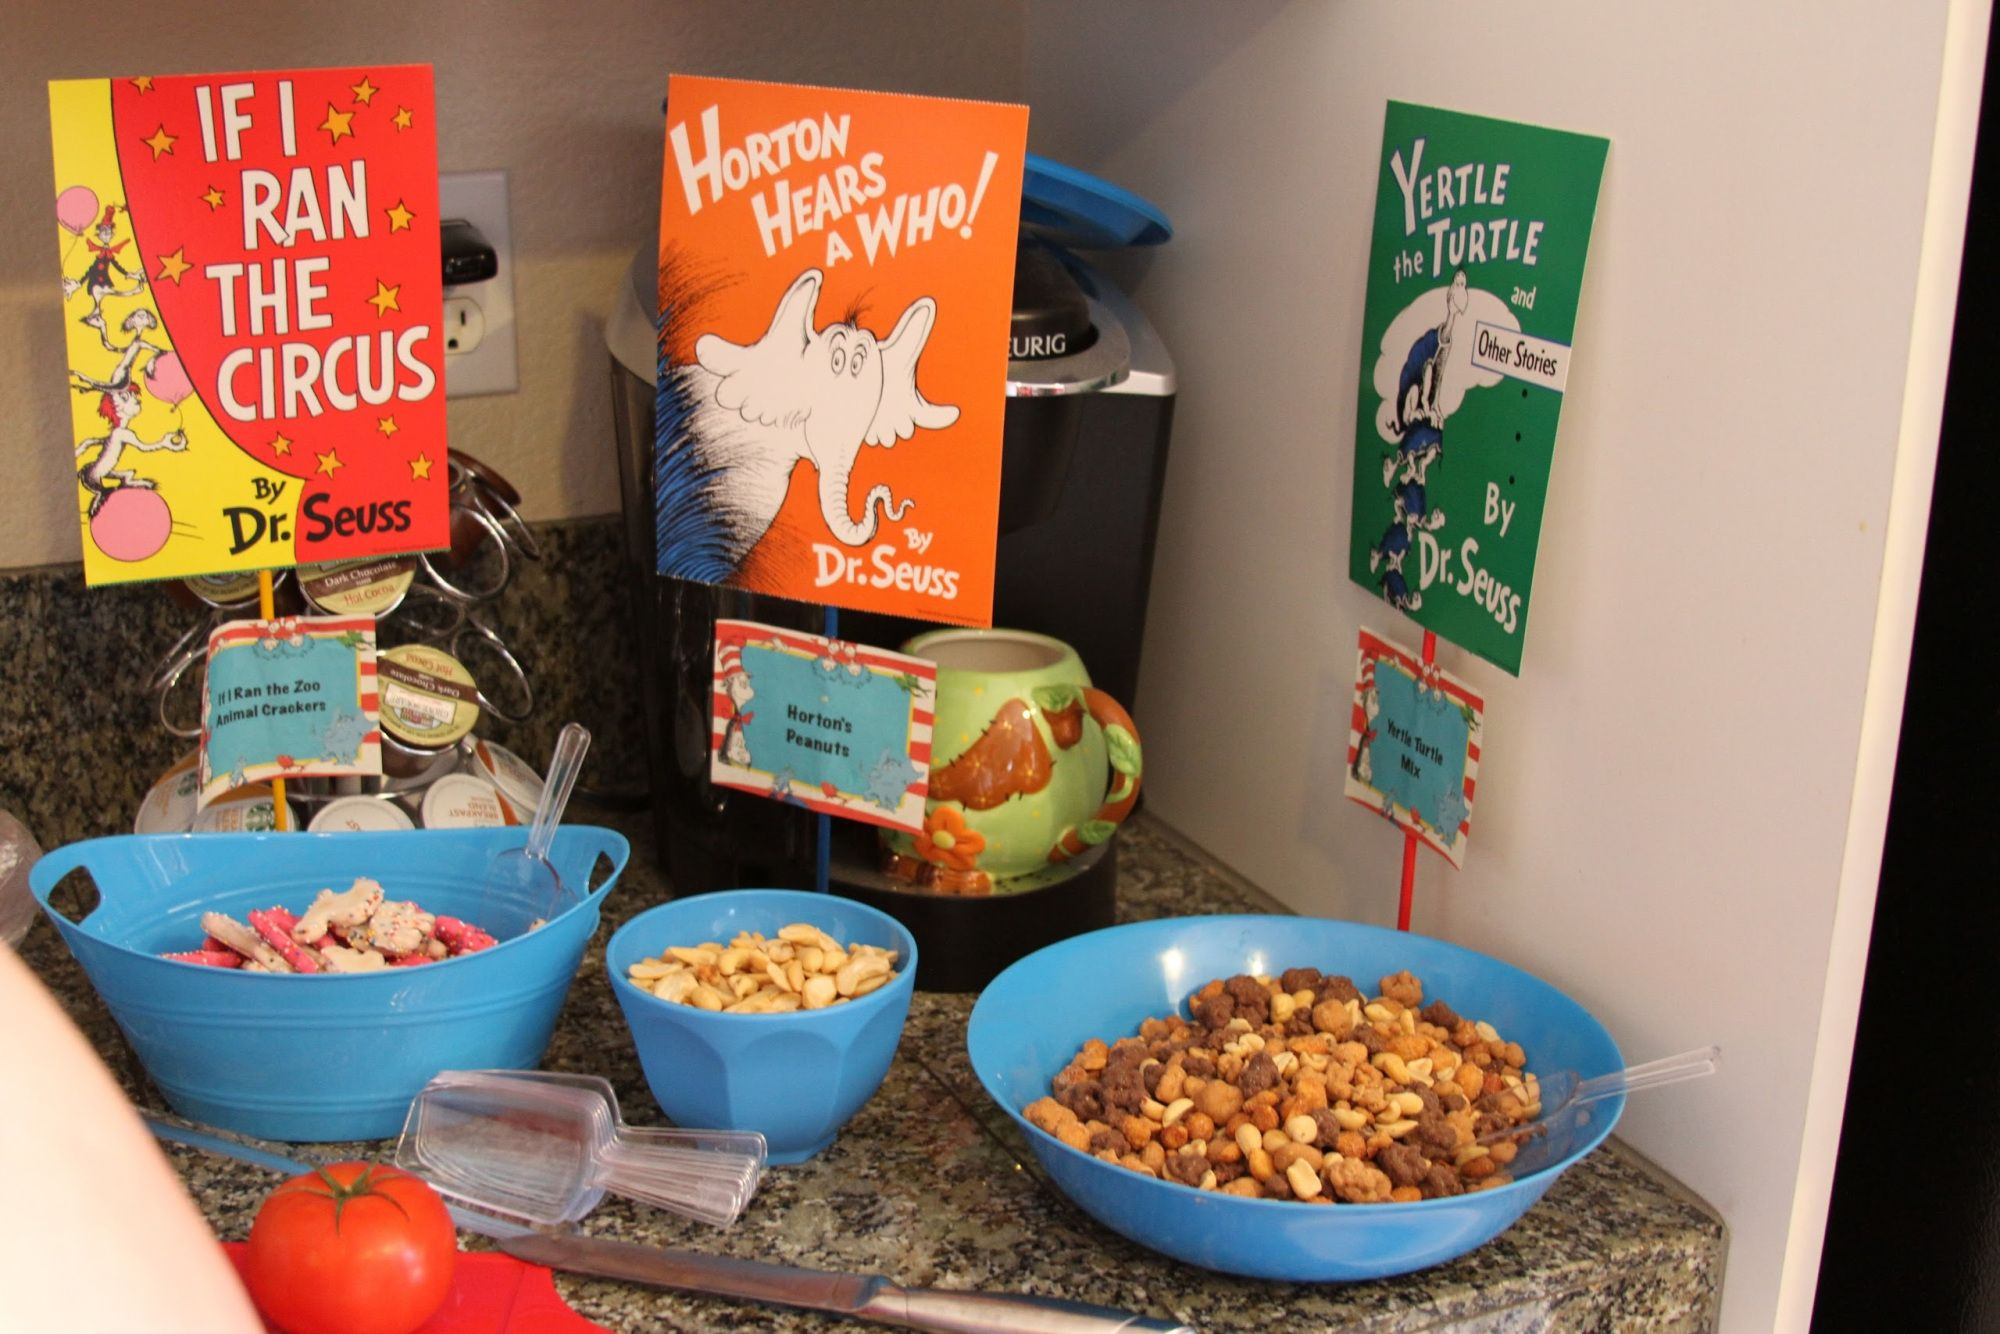 Dr Seuss Birthday Party Food Ideas If I Ran The